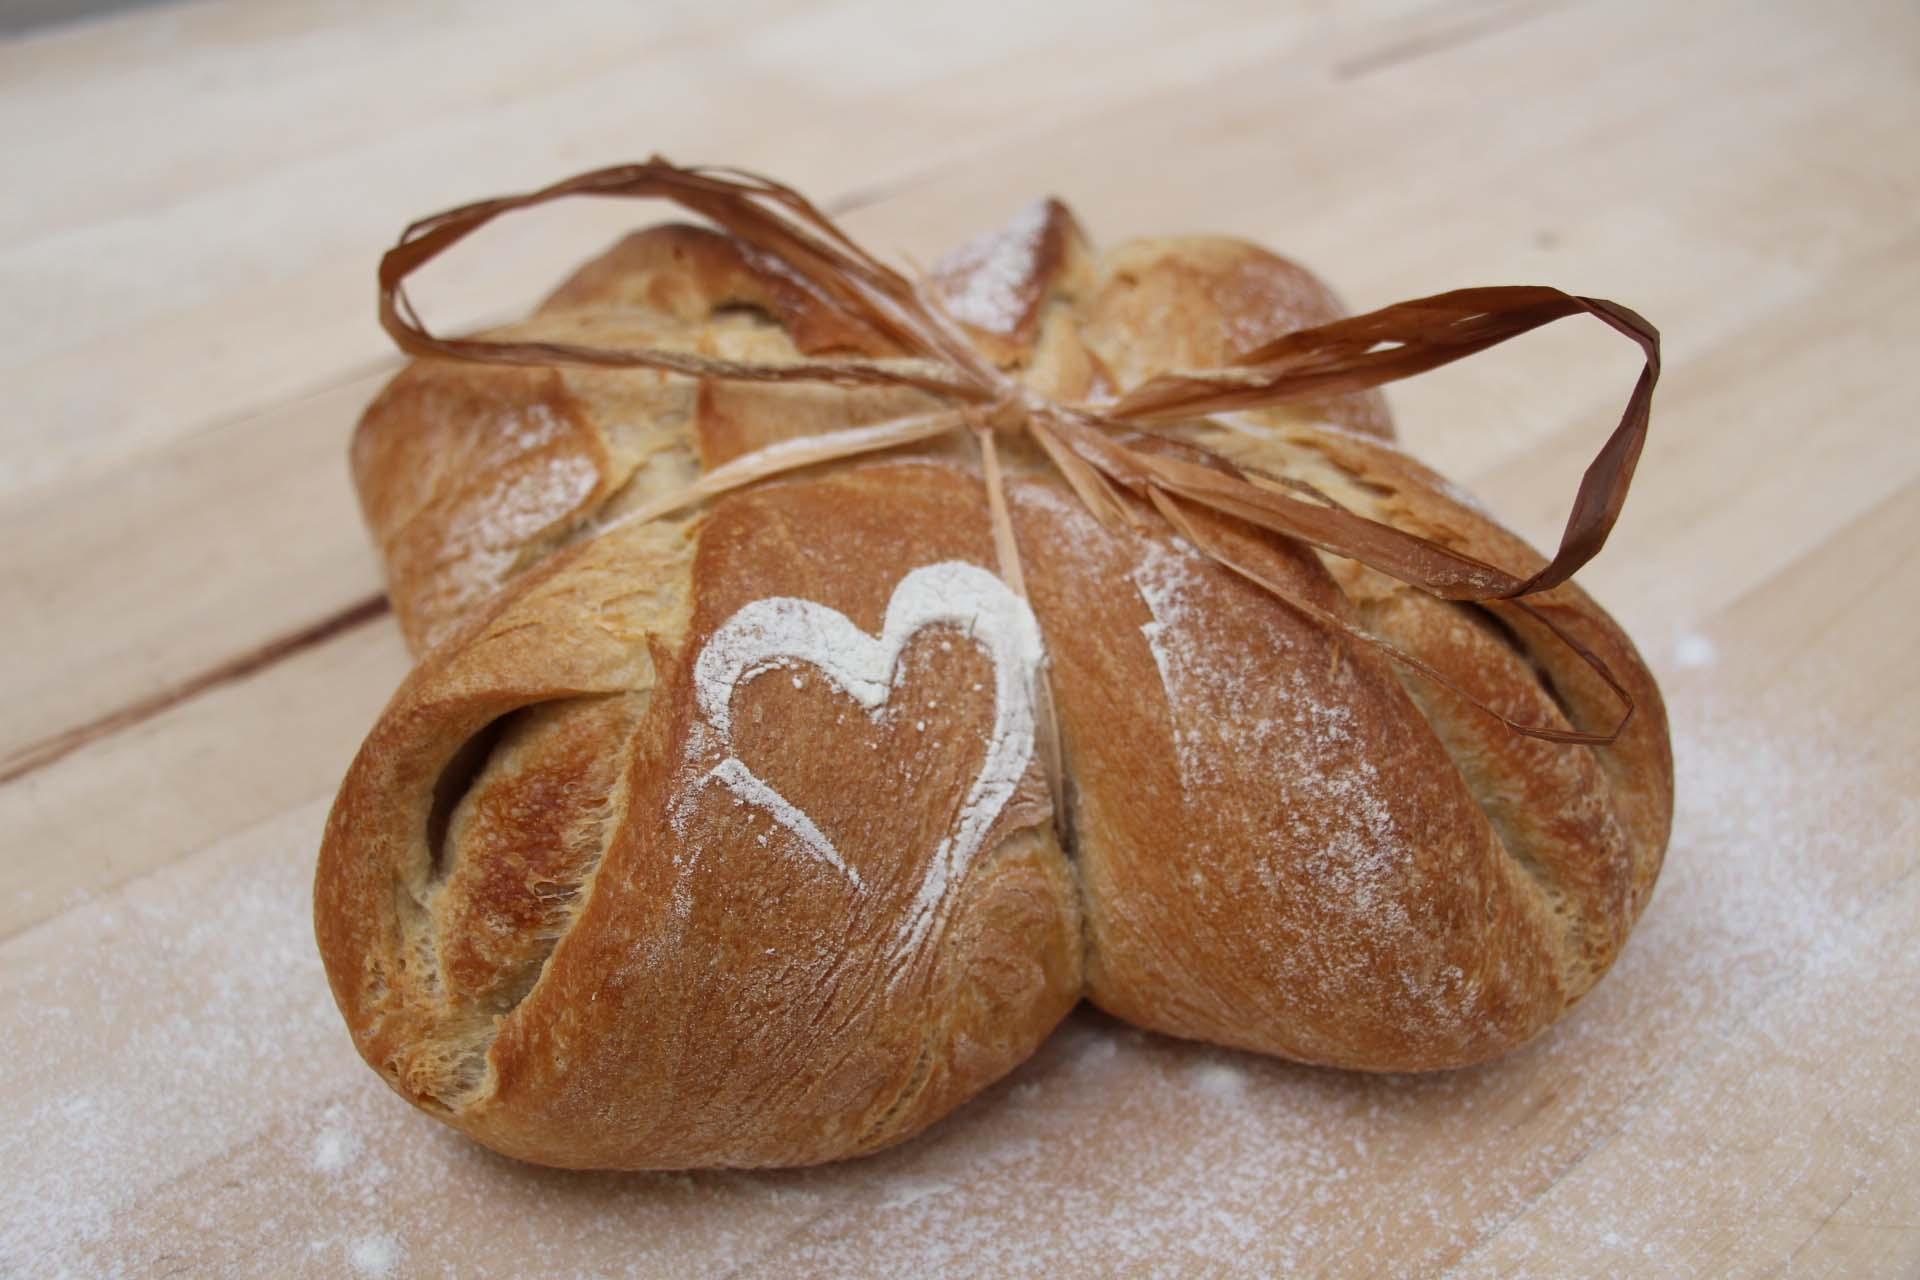 Brot mit Herz - www.akademie-weinheim.de - Bernd Siebold